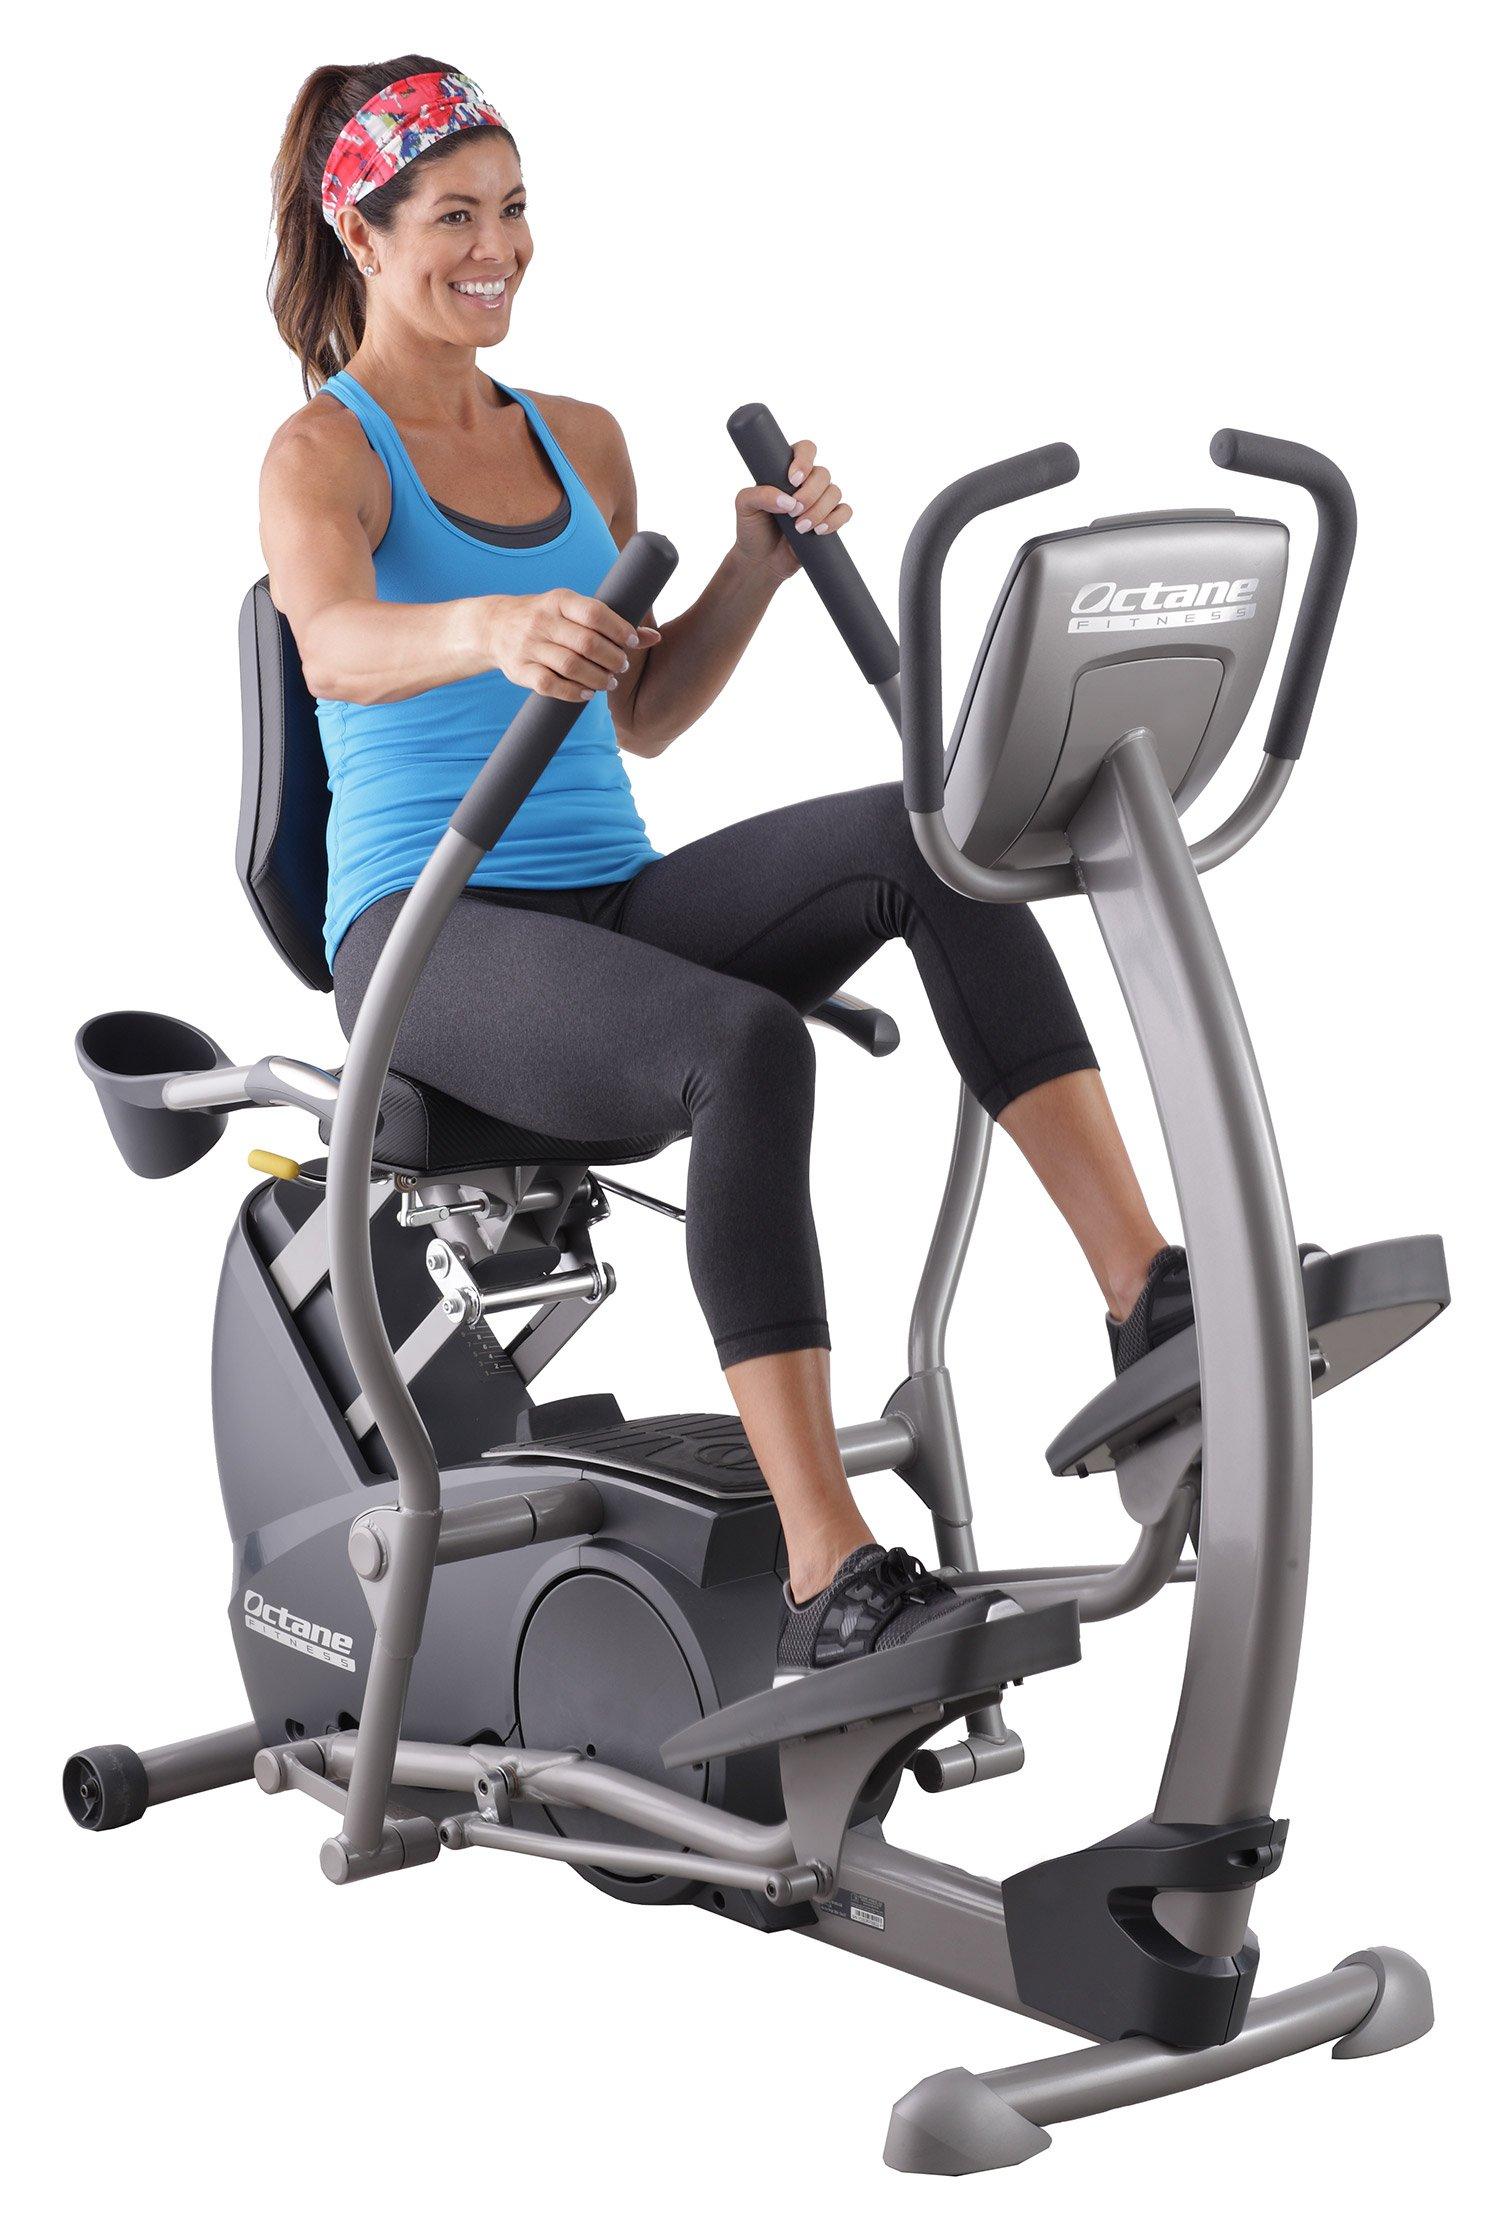 Octane Fitness xR4x Elliptical Trainer by Octane Fitness